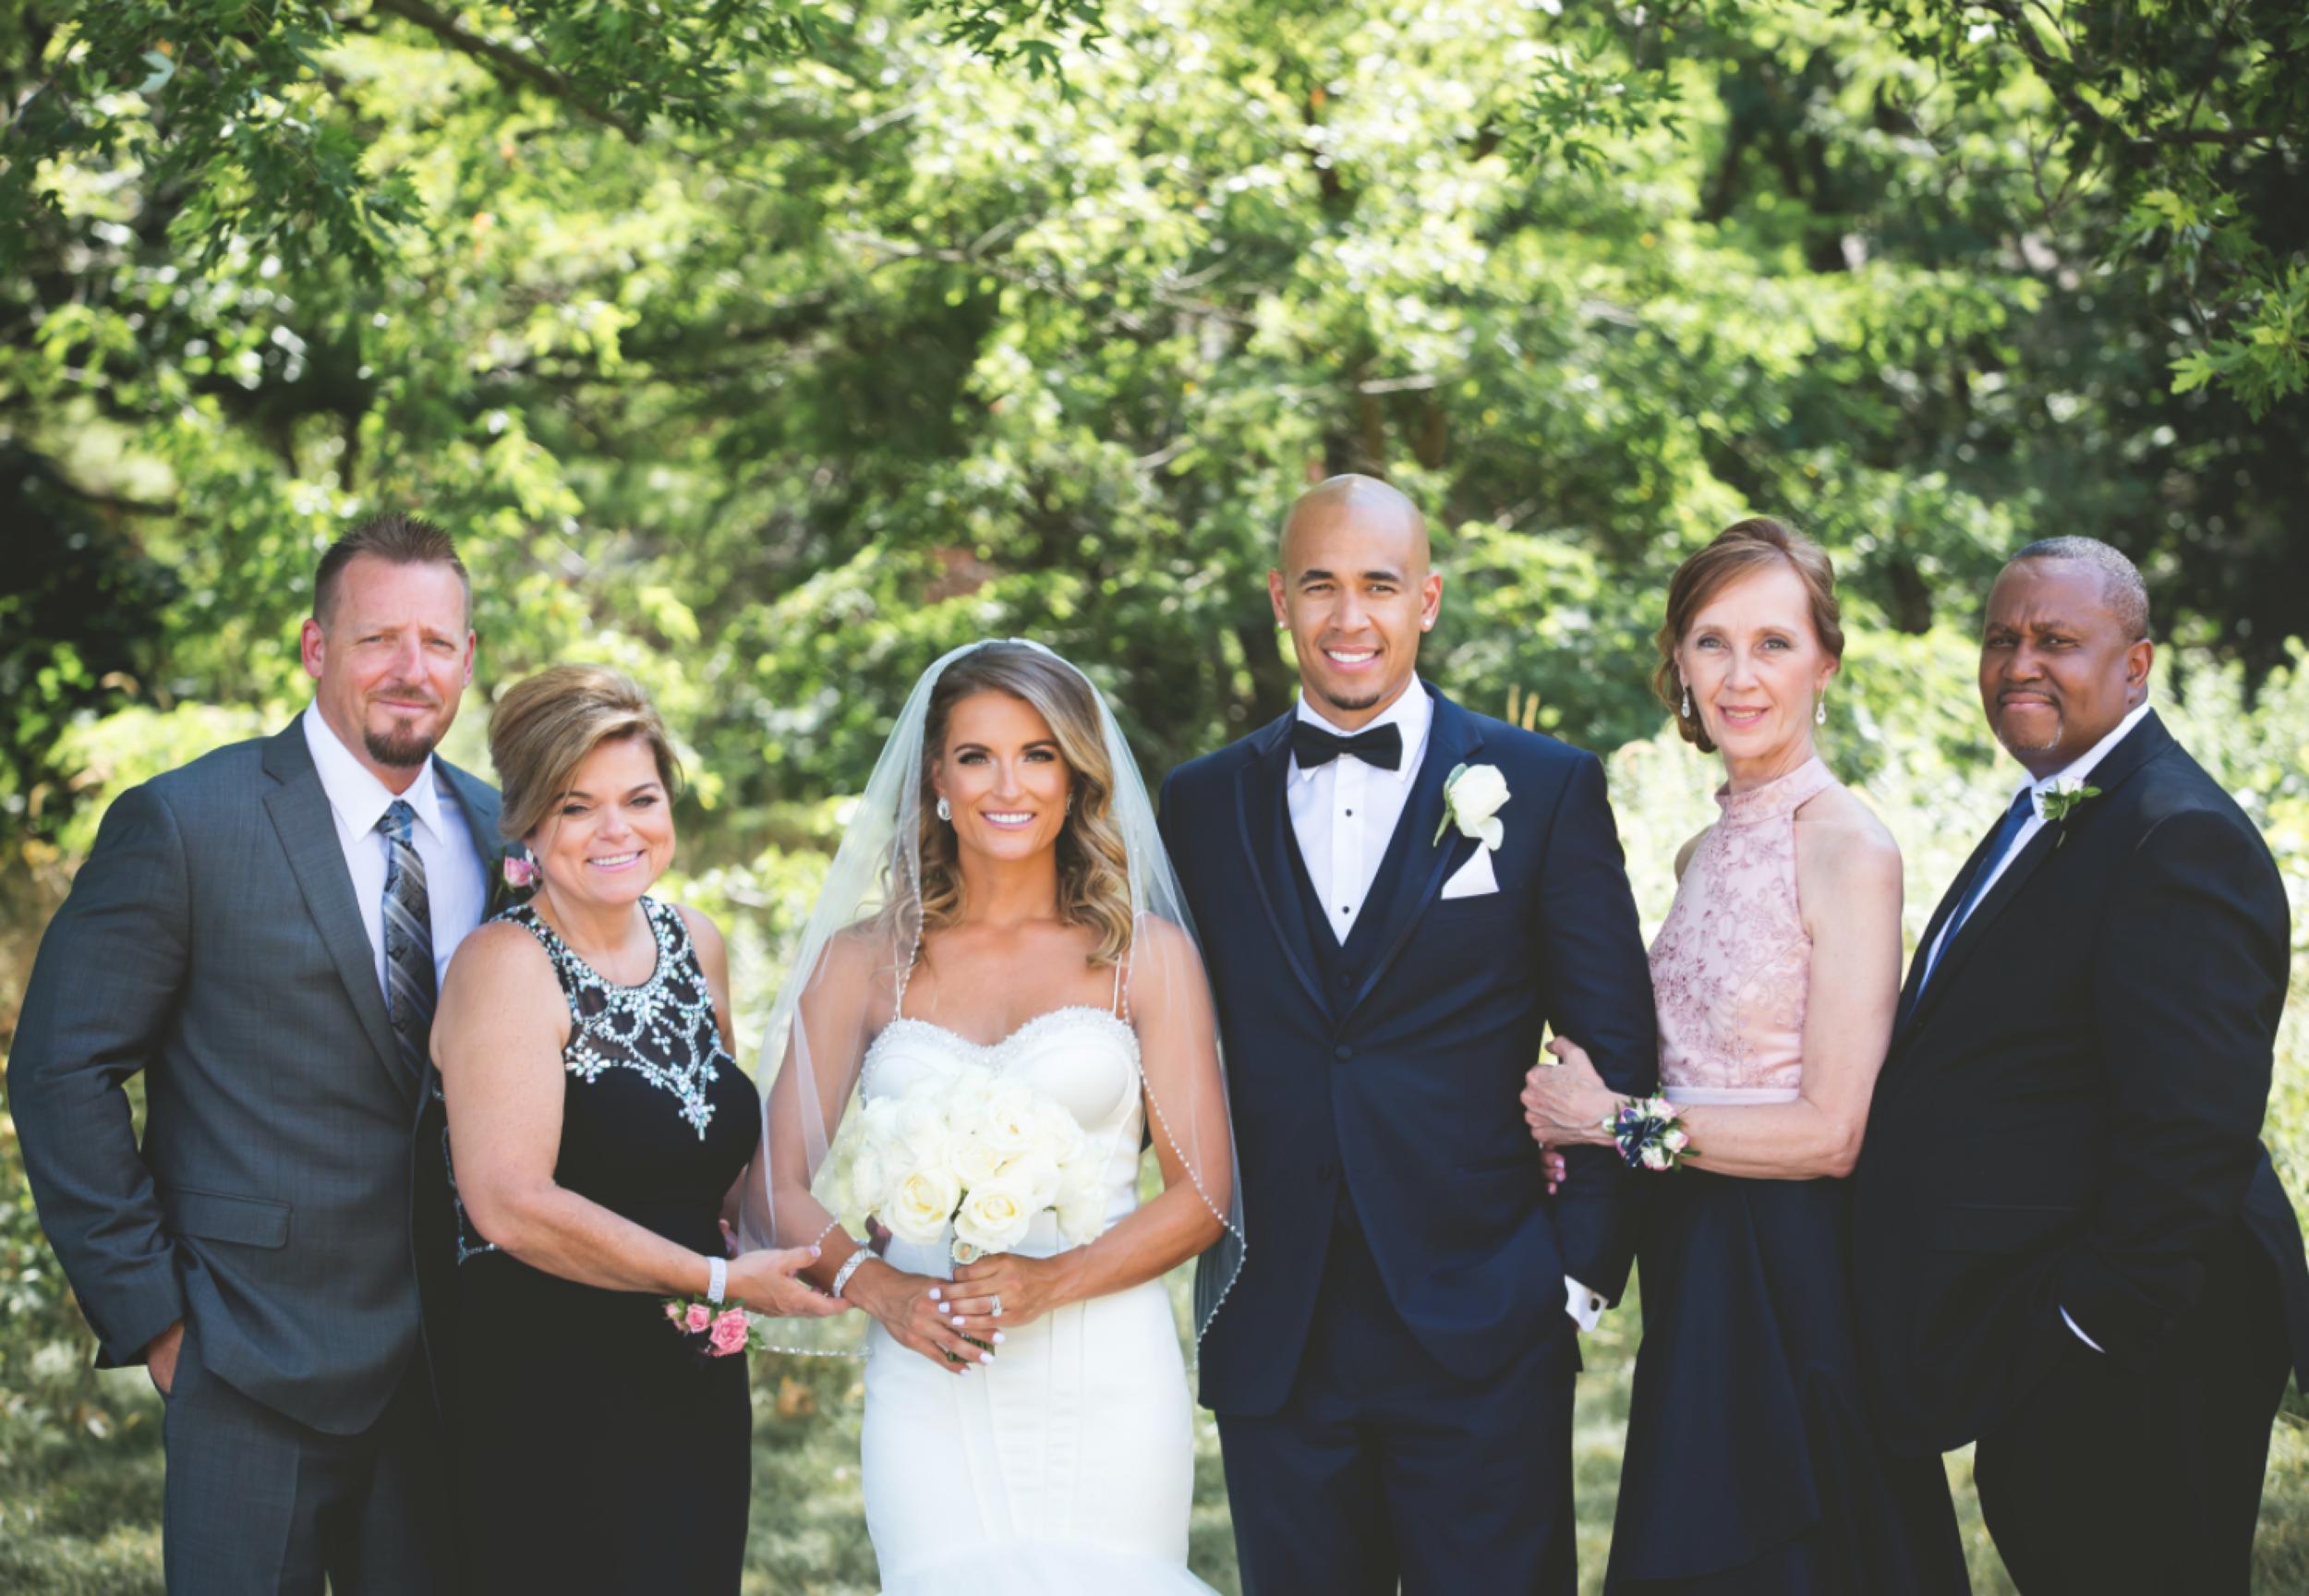 Wedding-Burlington-Convention-Center-Burlington-Oakville-Toronto-Hamilton-Niagara-Wedding-Photographer-Photography-Moments-by-Lauren-Photo-Image-27.png